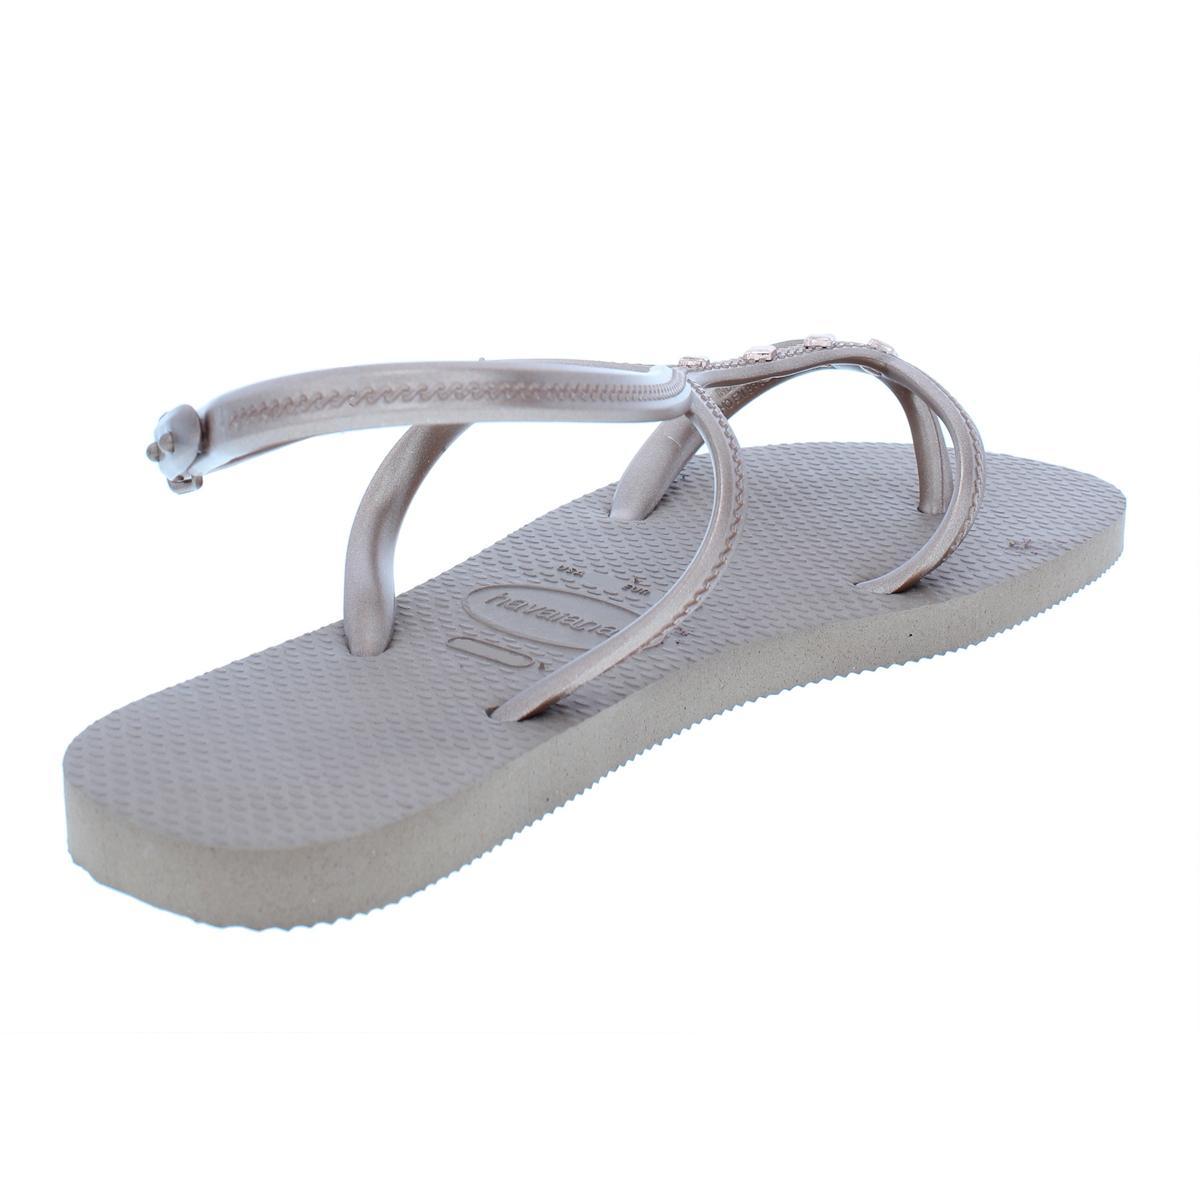 2cb35b7d5d1d Havaianas Womens Allure Maxi Beige Flip-flops Sandals 6 Medium (b M ...